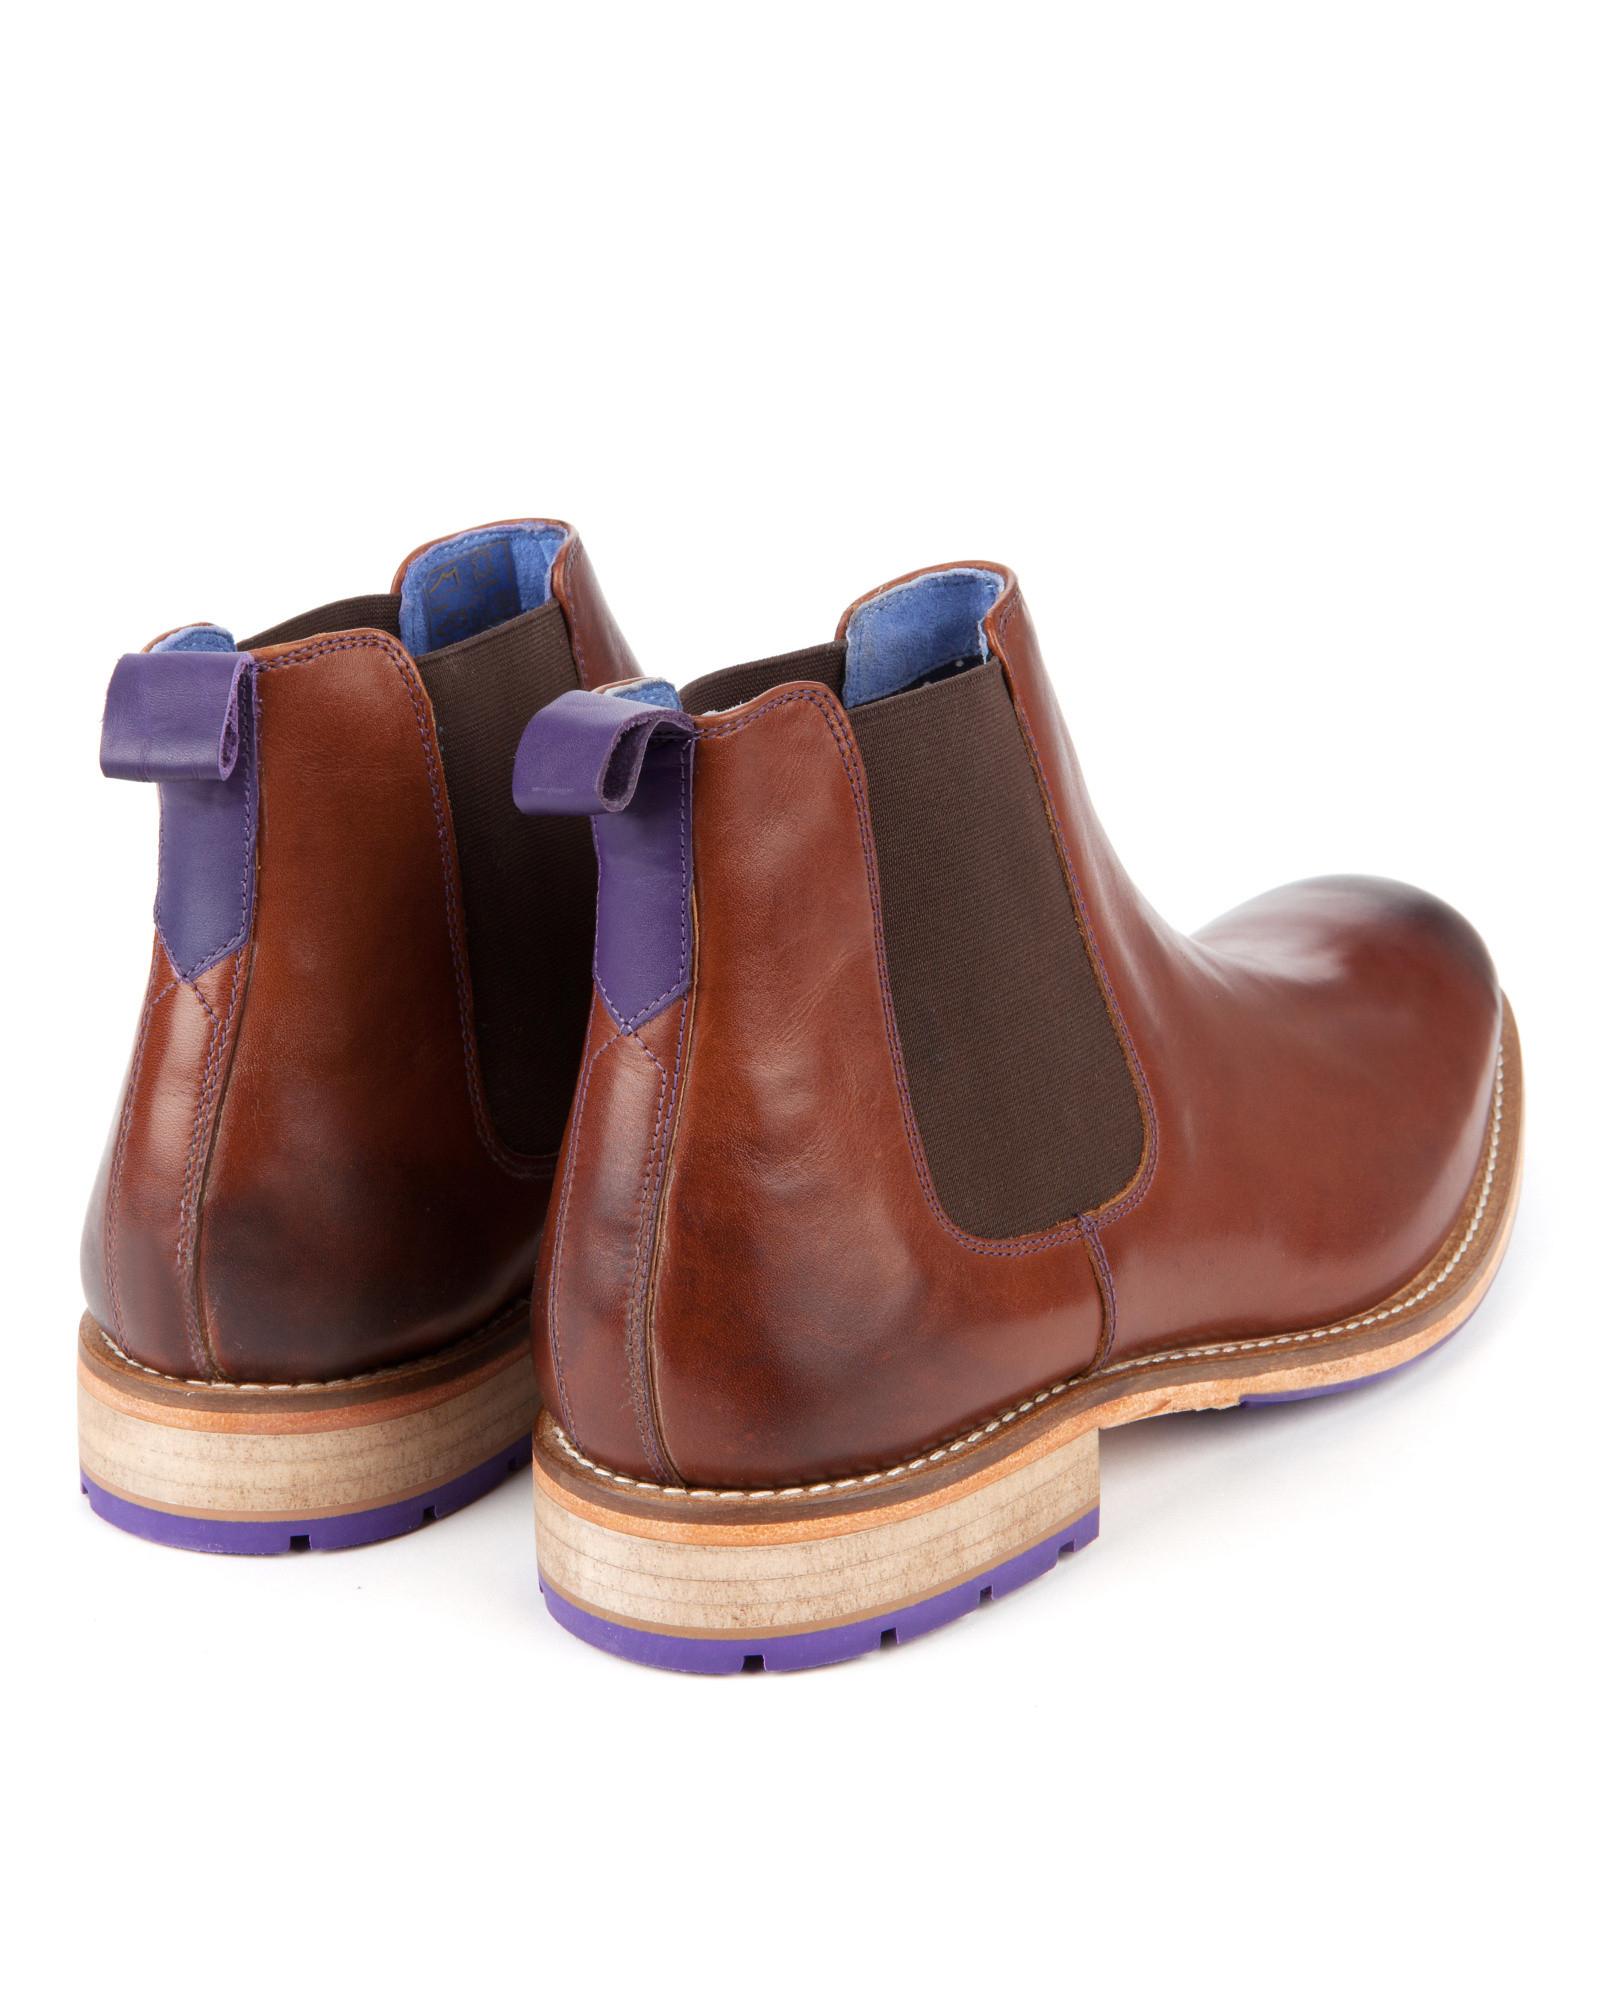 4dd2e77aea1 Ted Baker Brown Leather Chelsea Boot for men